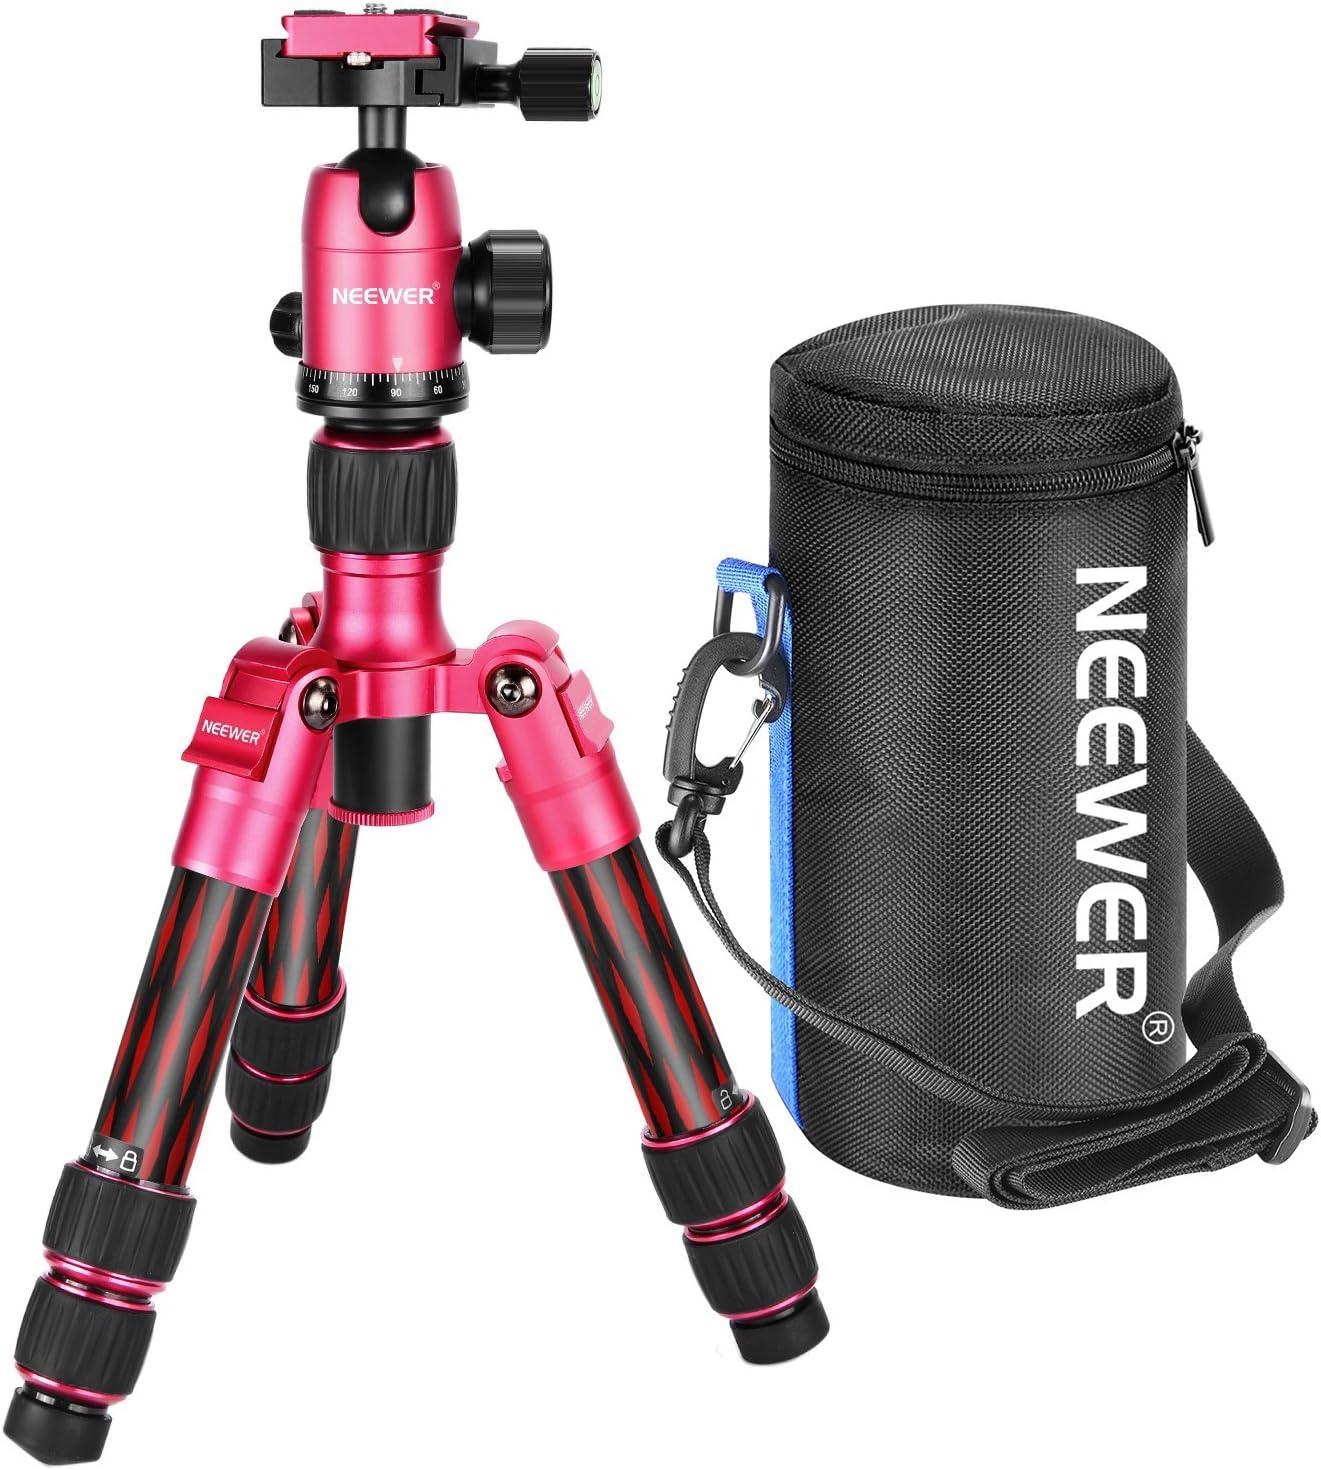 Neewer Mini Stativ Aus Karbonfaser 50 Cm Tragbar Für Kamera